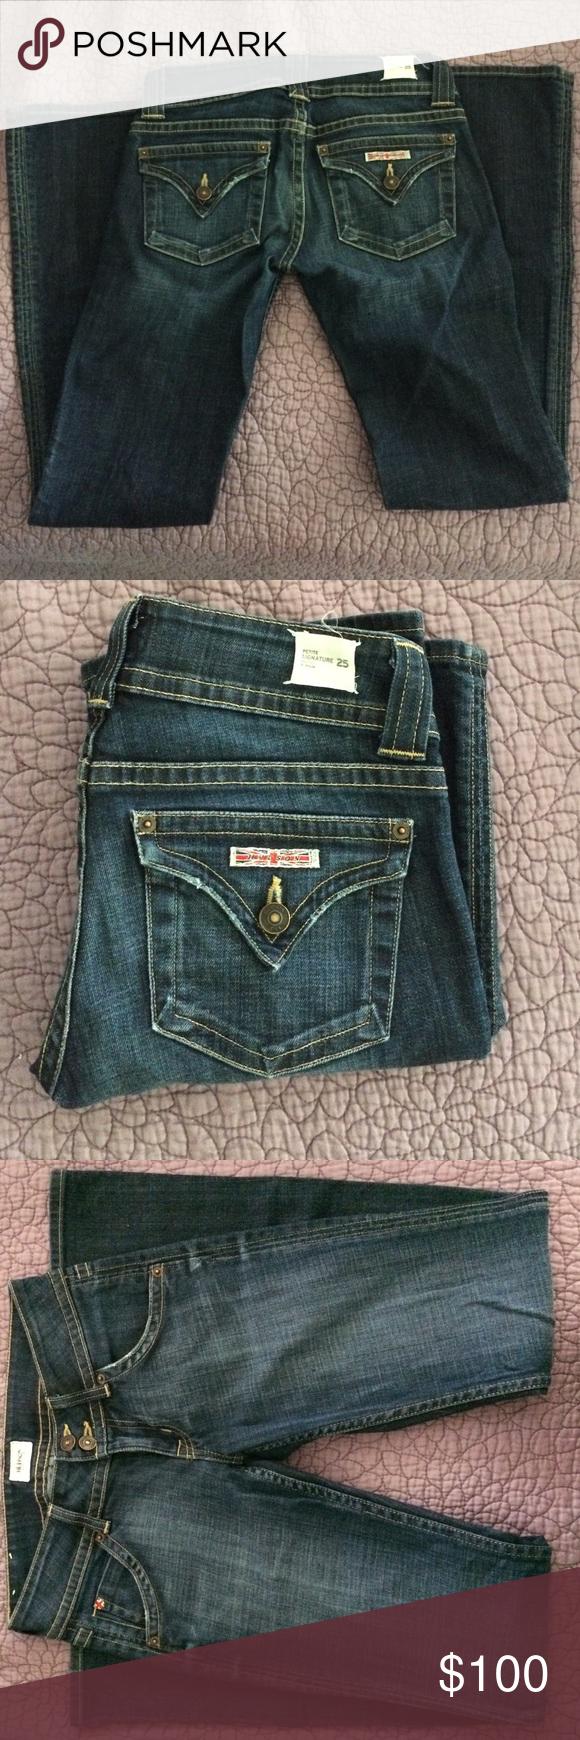 Hudson Jeans New Hudson Jeans Jeans Boot Cut